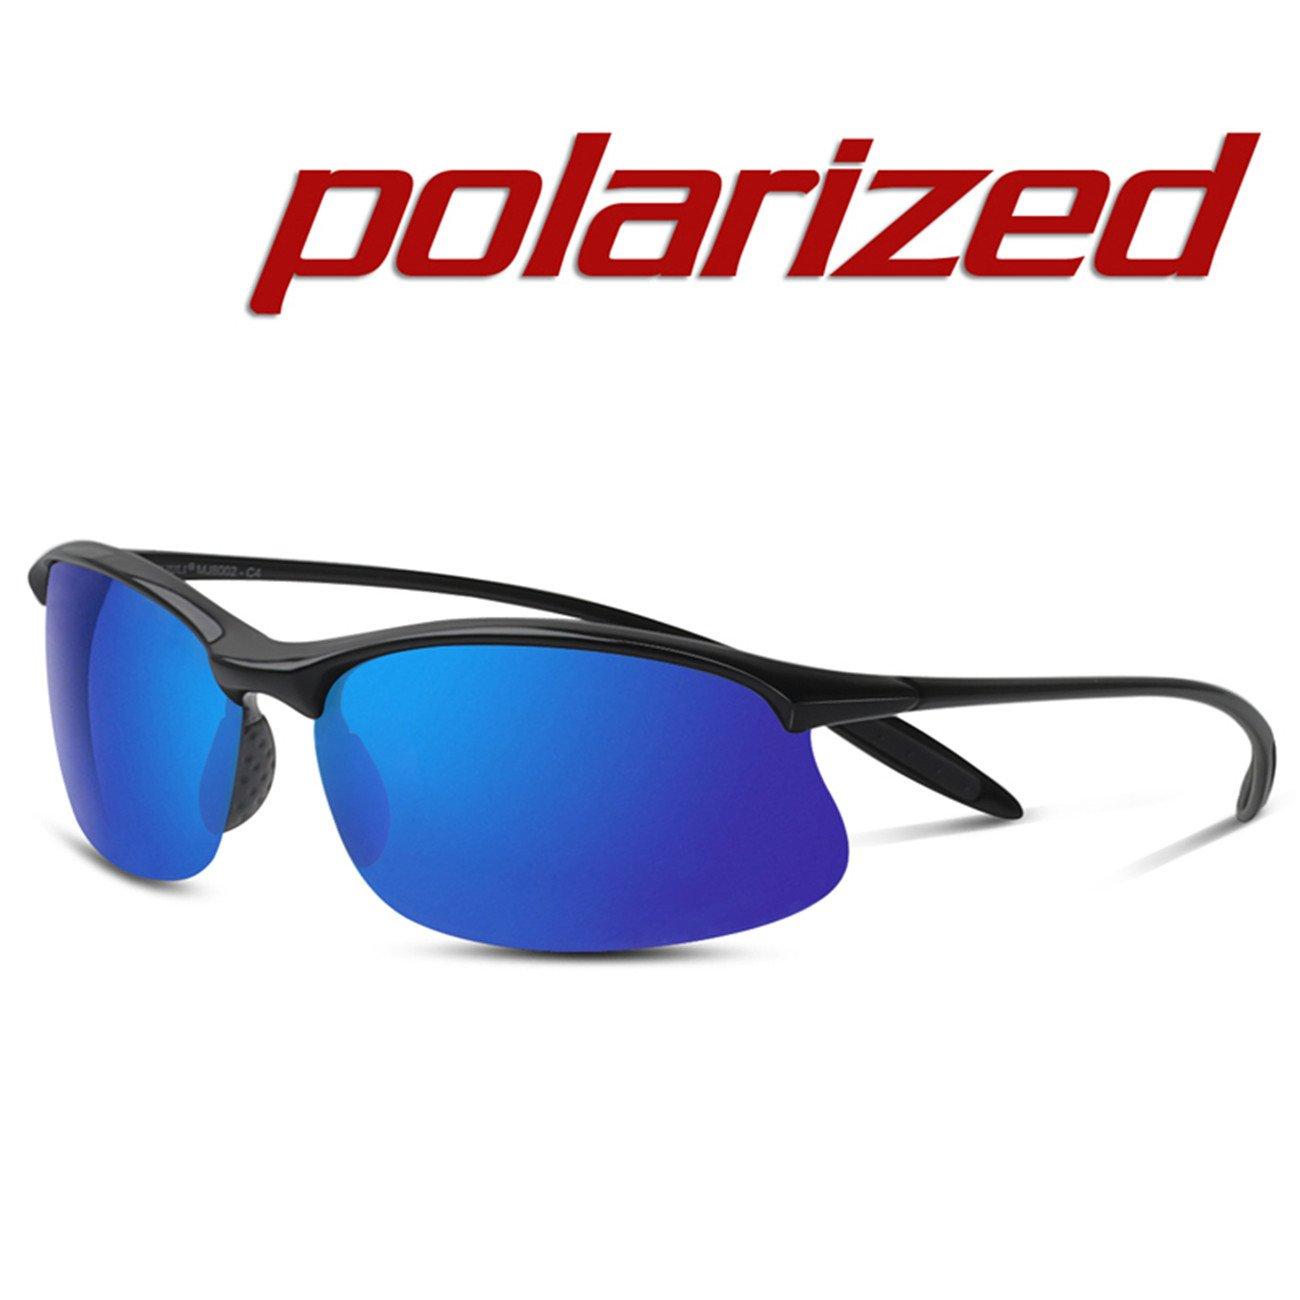 JULI Sport Polarisiert Sport Sonnenbrillen Damen Herren Dauerhaft Rahmen D731 eRwNQcozo